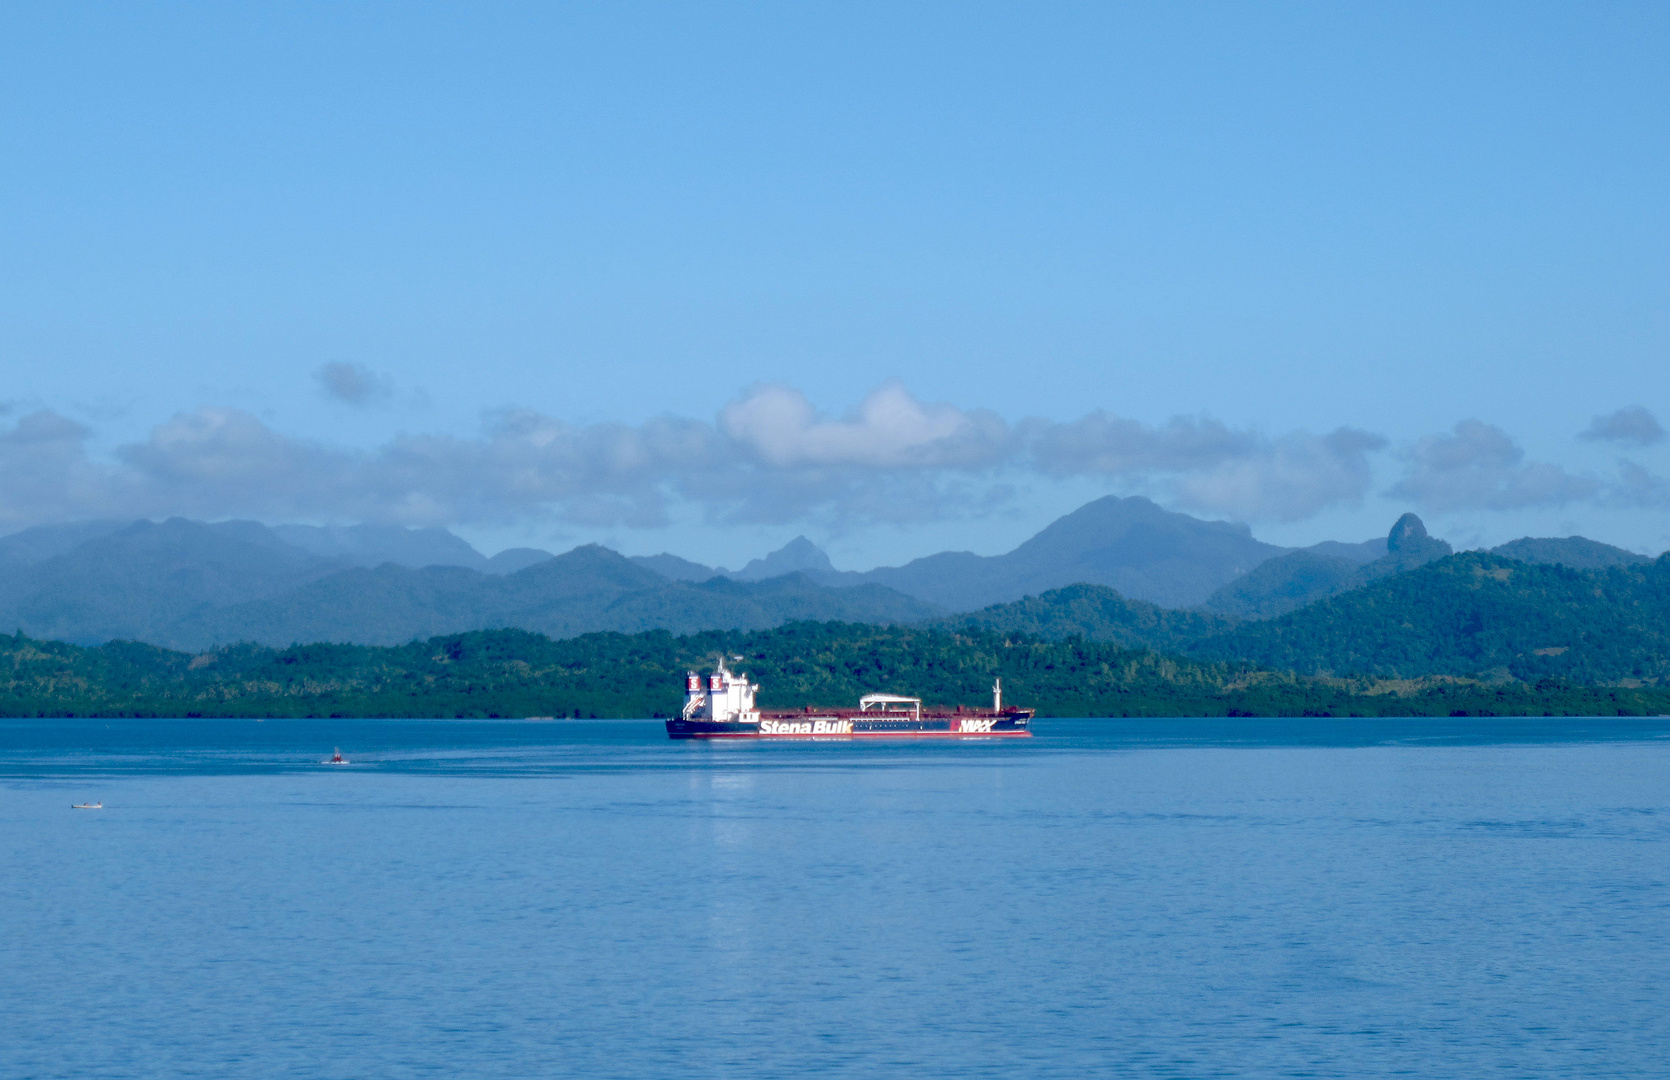 300 Inseln gehören zu den Fijis.